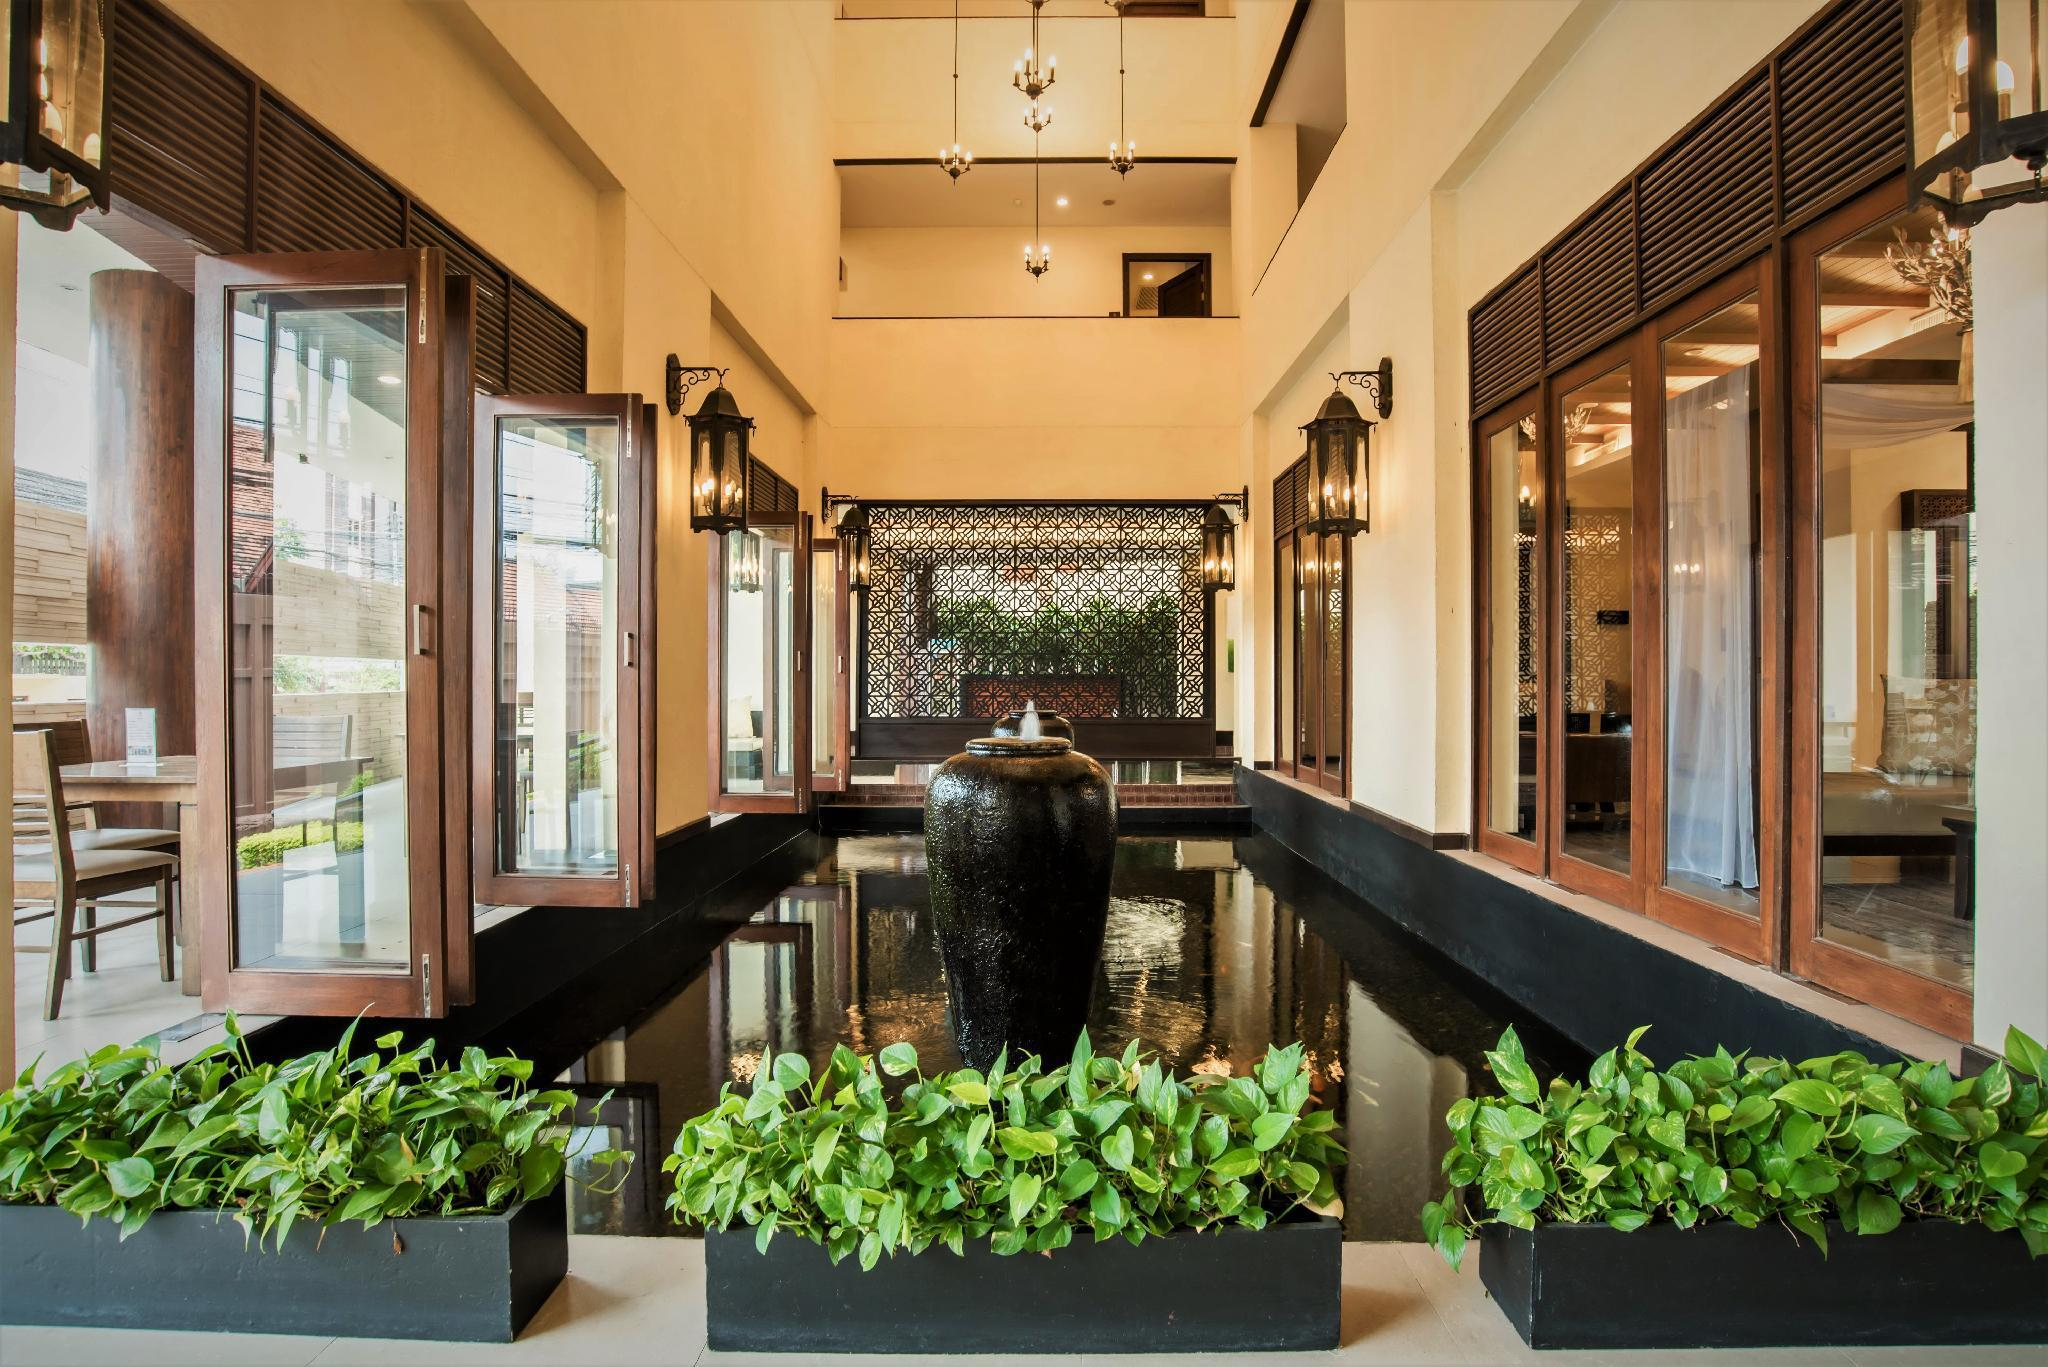 De Chai Colonial Hotel & Spa เดอ ชาย โคโลเนียล โฮเต็ล แอนด์ สปา